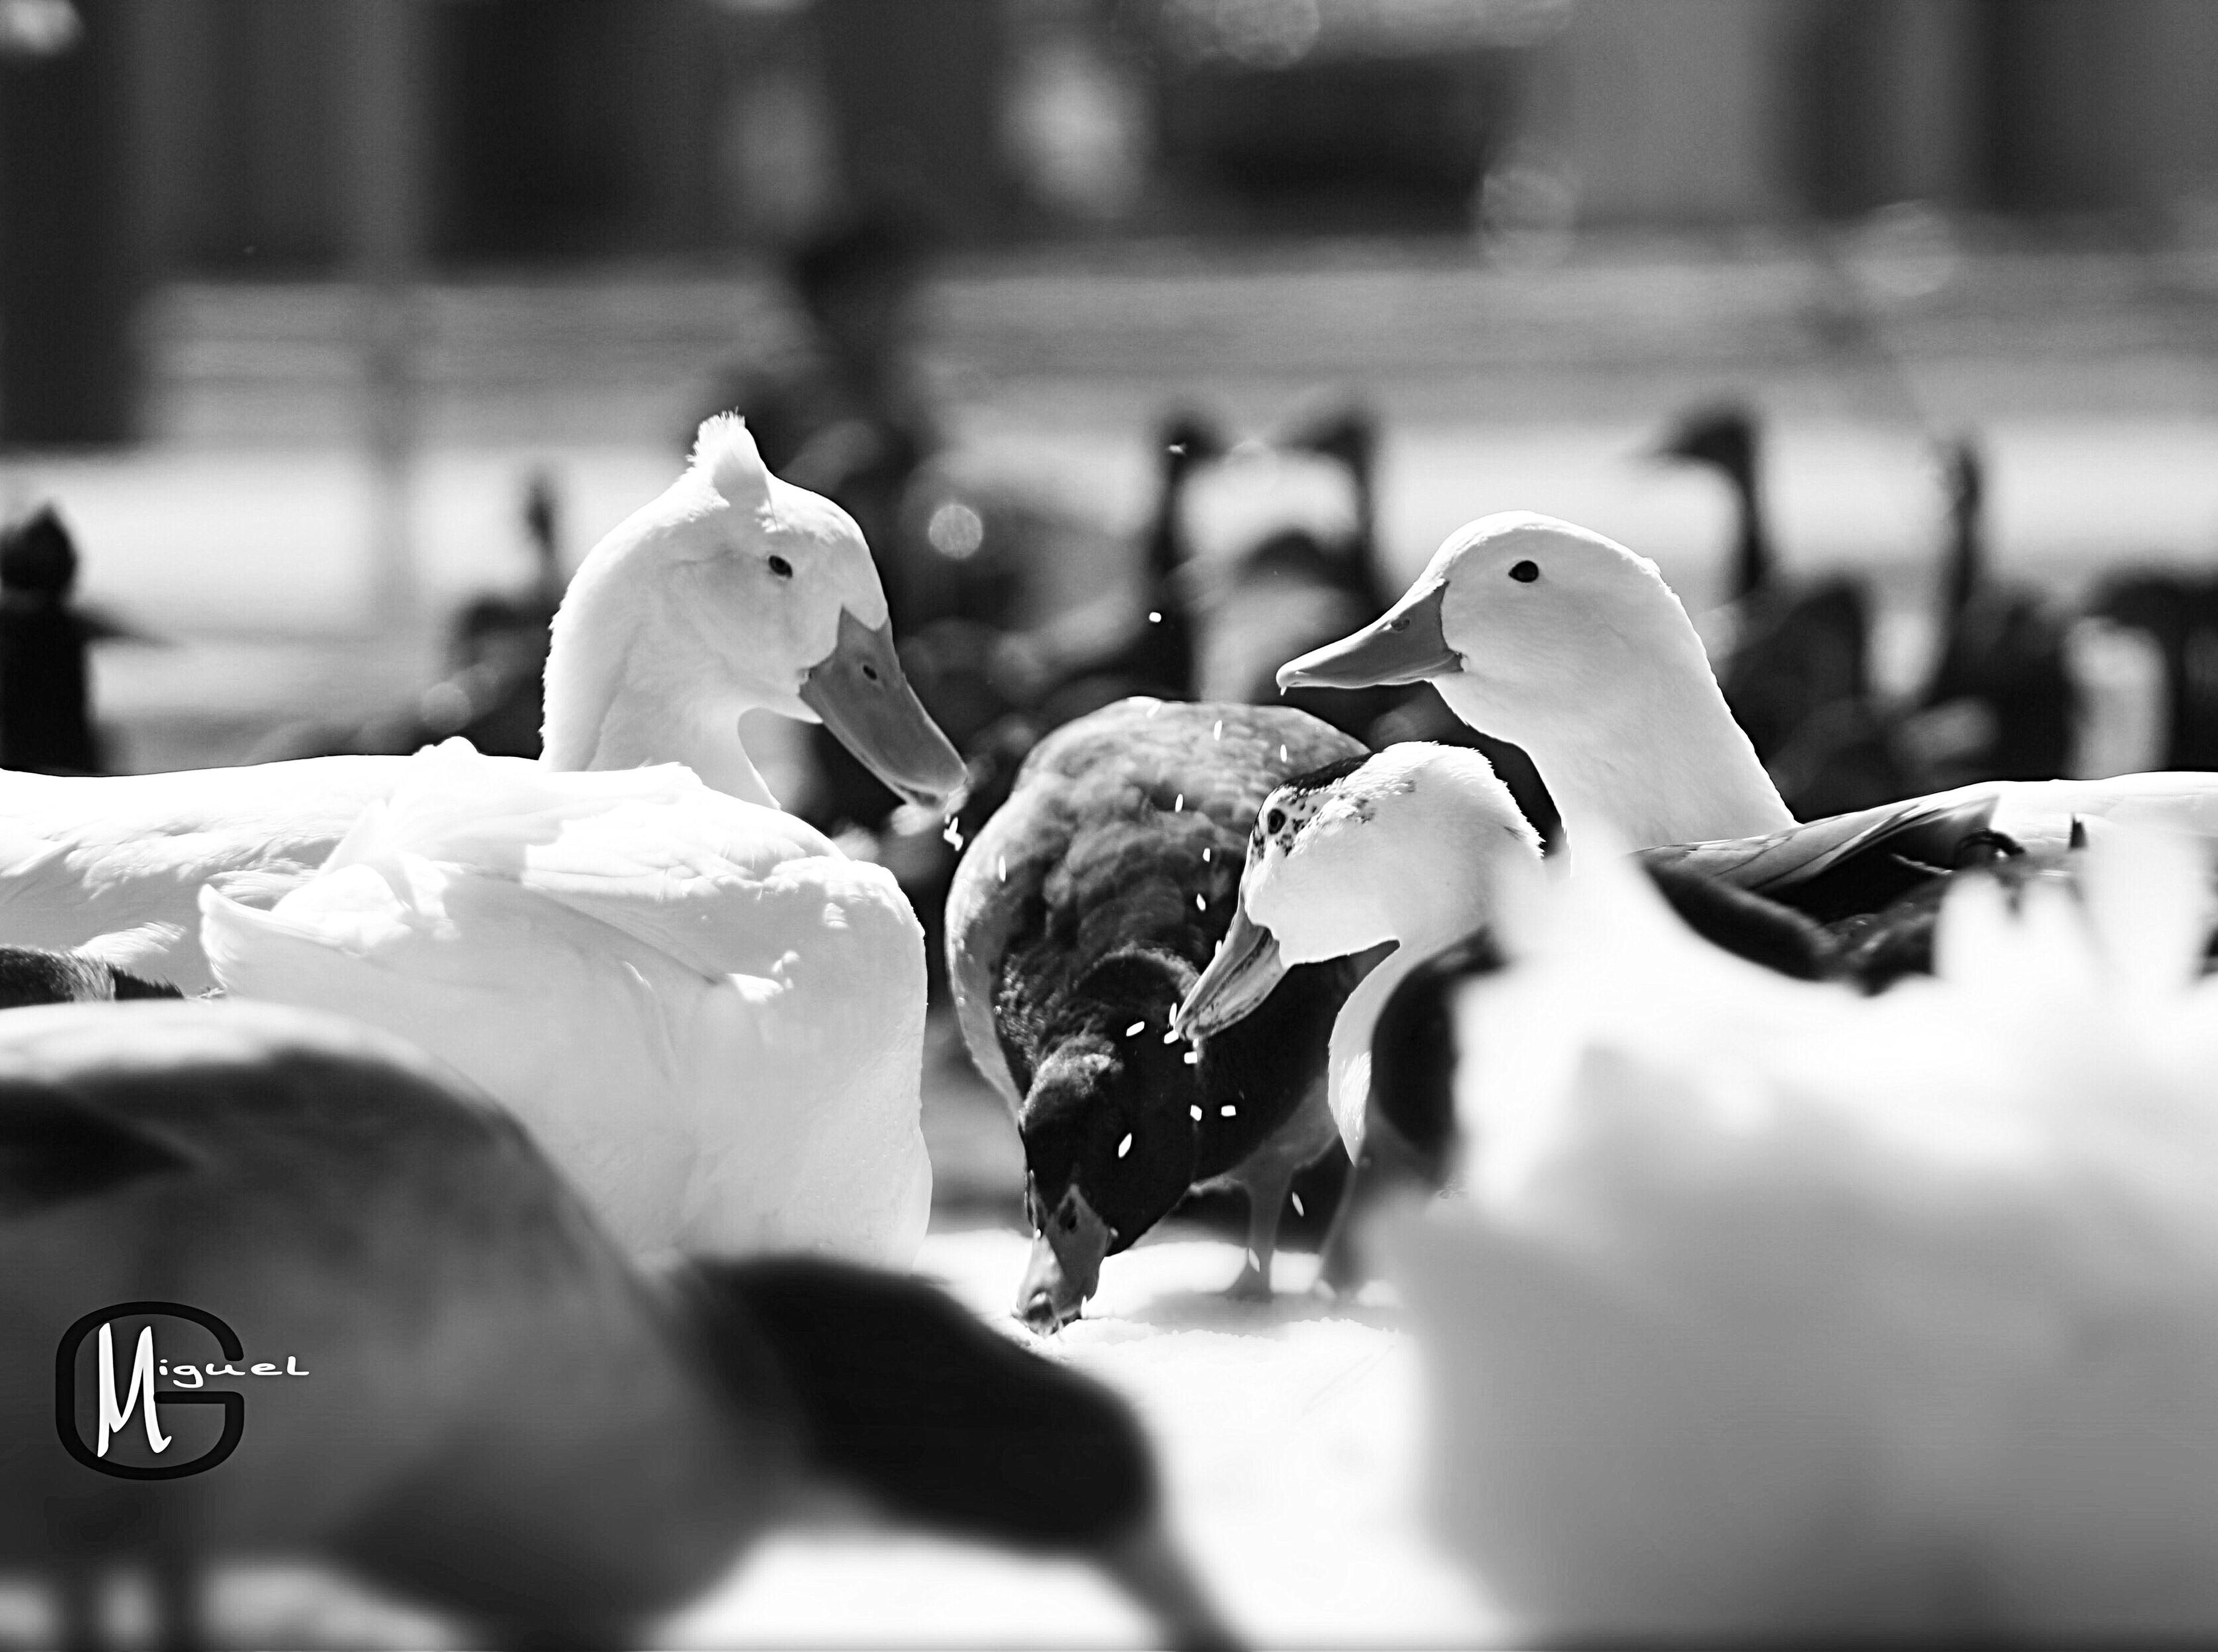 Bird Animals In The Wild Animal Wildlife Day Close-up No People Outdoors Ducks Duck Park Feeding  Feeding Animals Feeding The Birds Feeding Time Feeding Ducks Surroundedbyducks Nature Canonphotography Canonrebelt5 Photography Photoshoot Photographylovers Photojournalism Enjoying Life Enjoying The Sun EyeEmNewHere